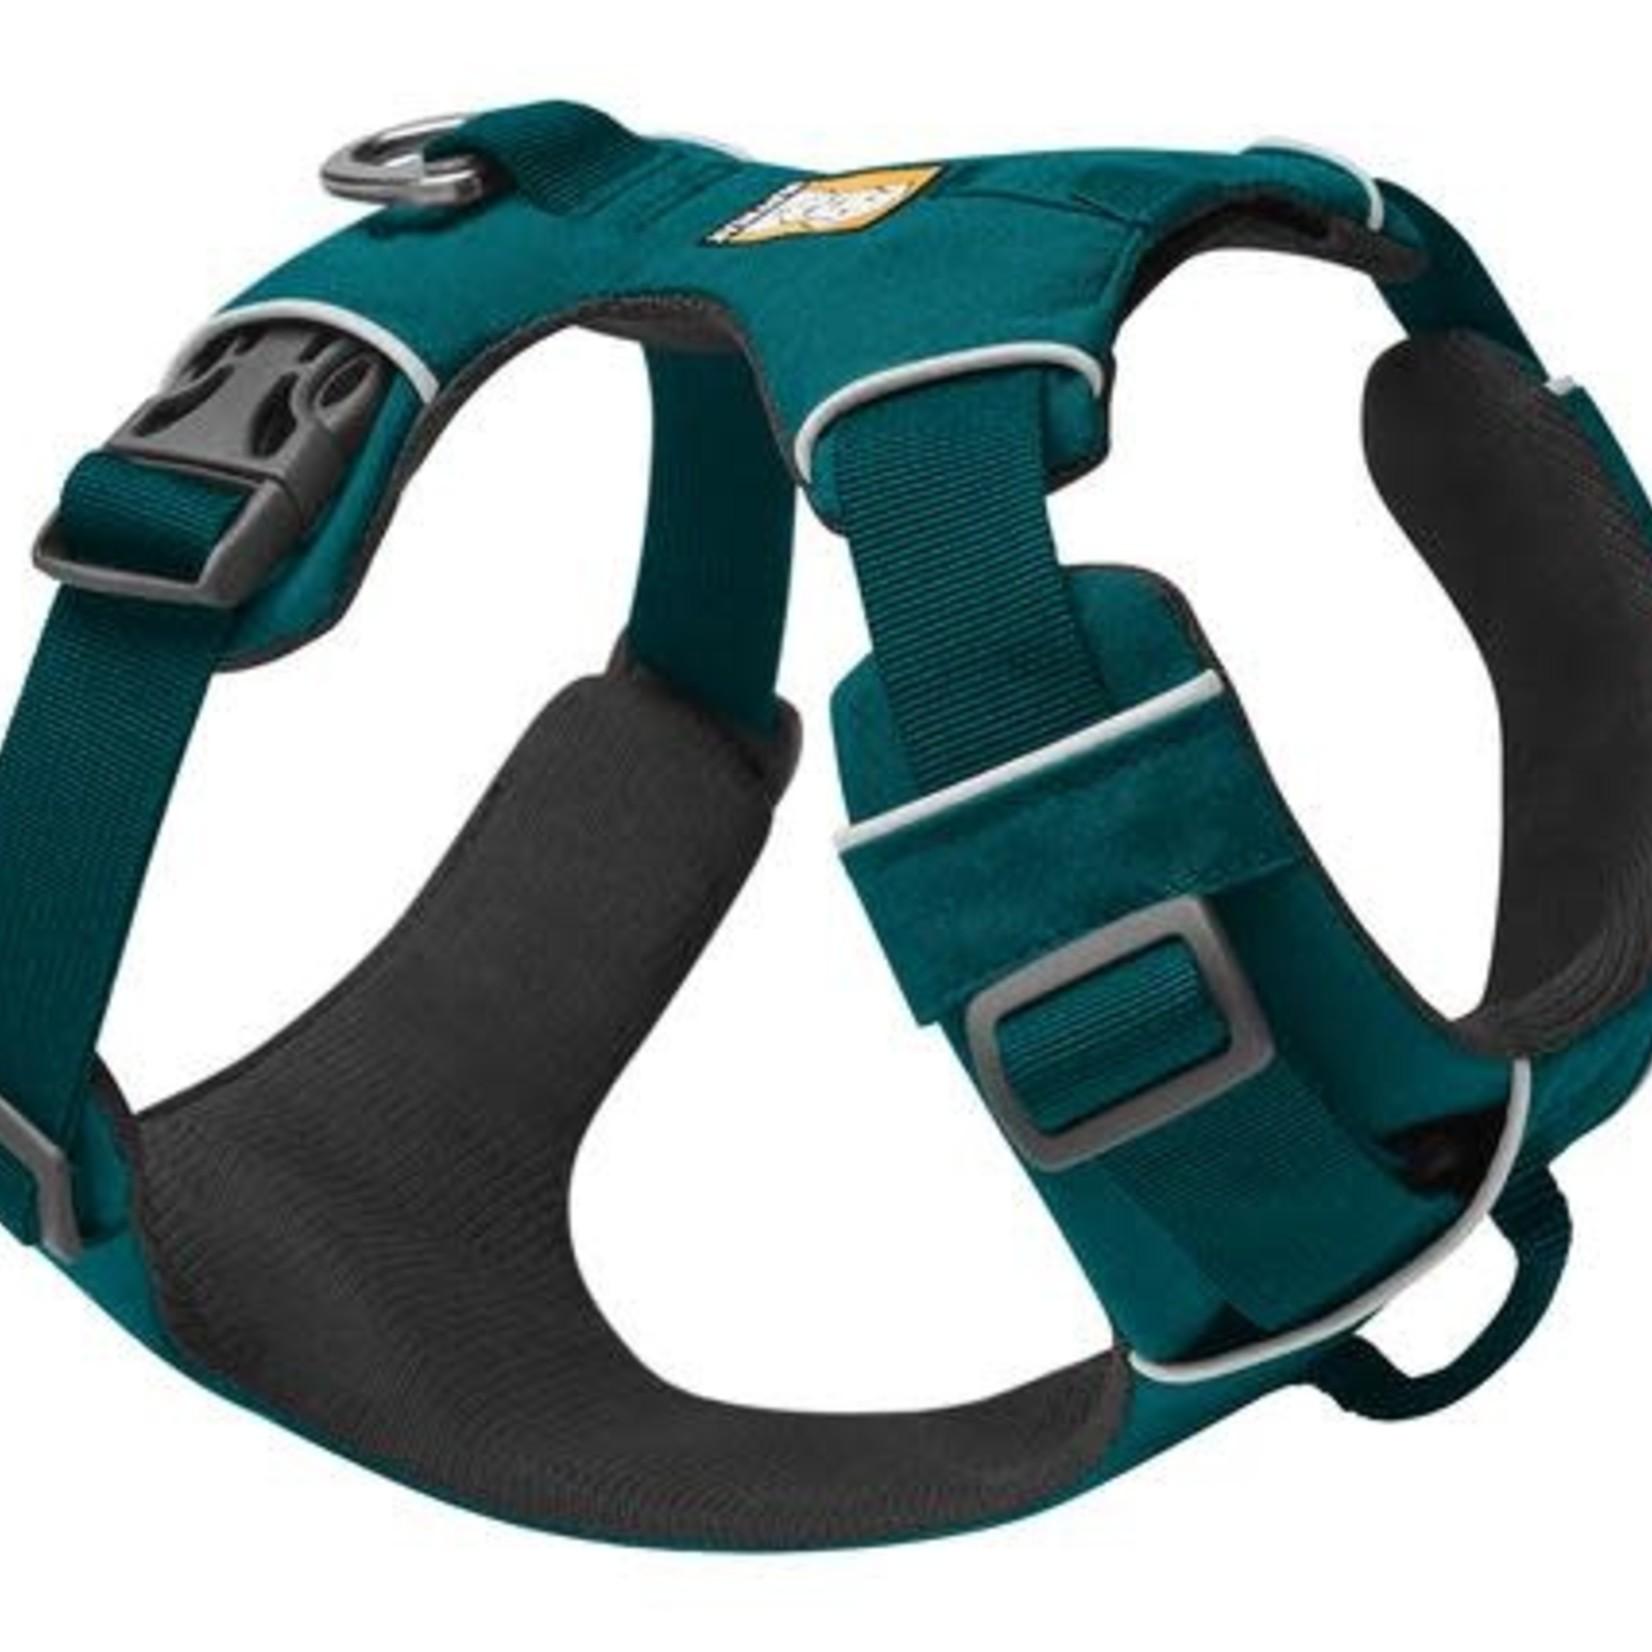 Ruff Wear Ruffwear Front Range Harness Tumalo Teal Small